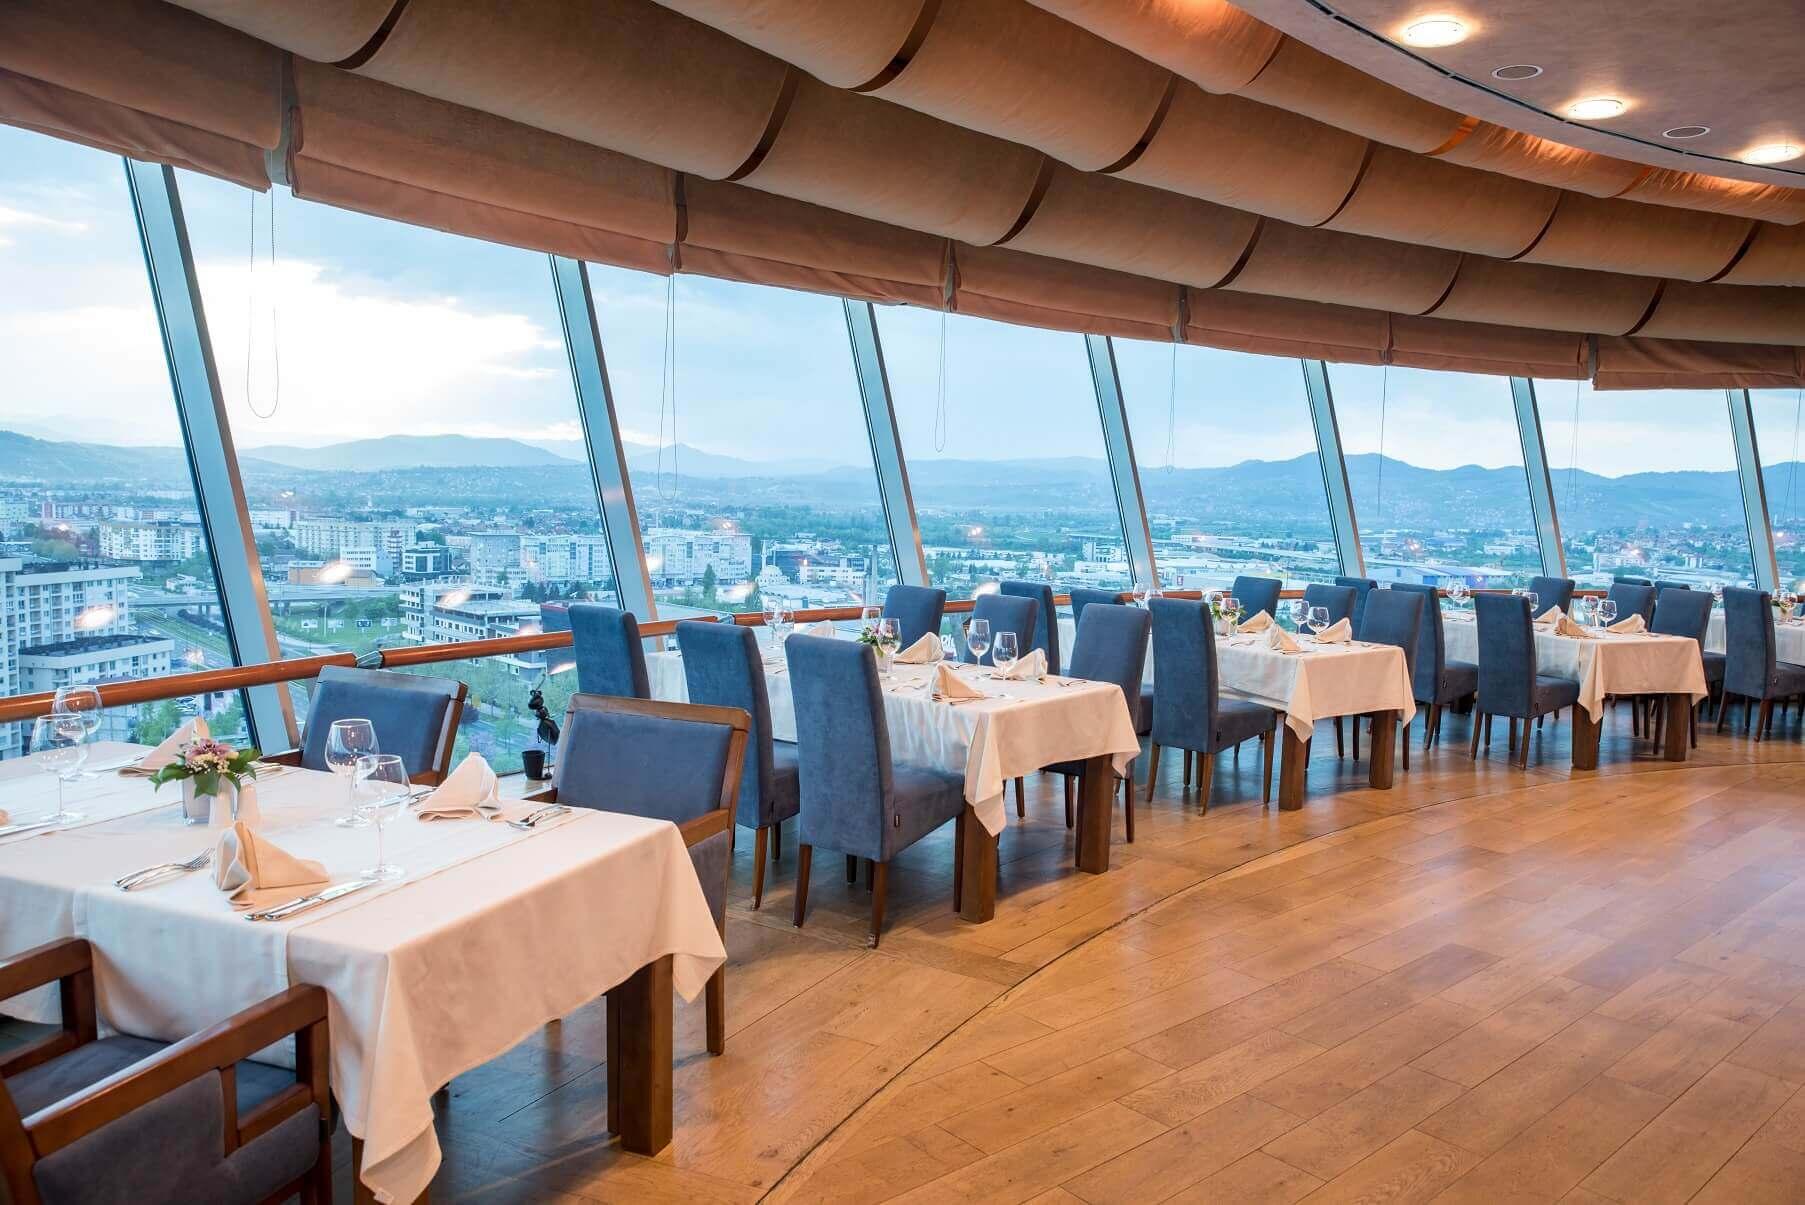 Sarajevo rotating restaurant